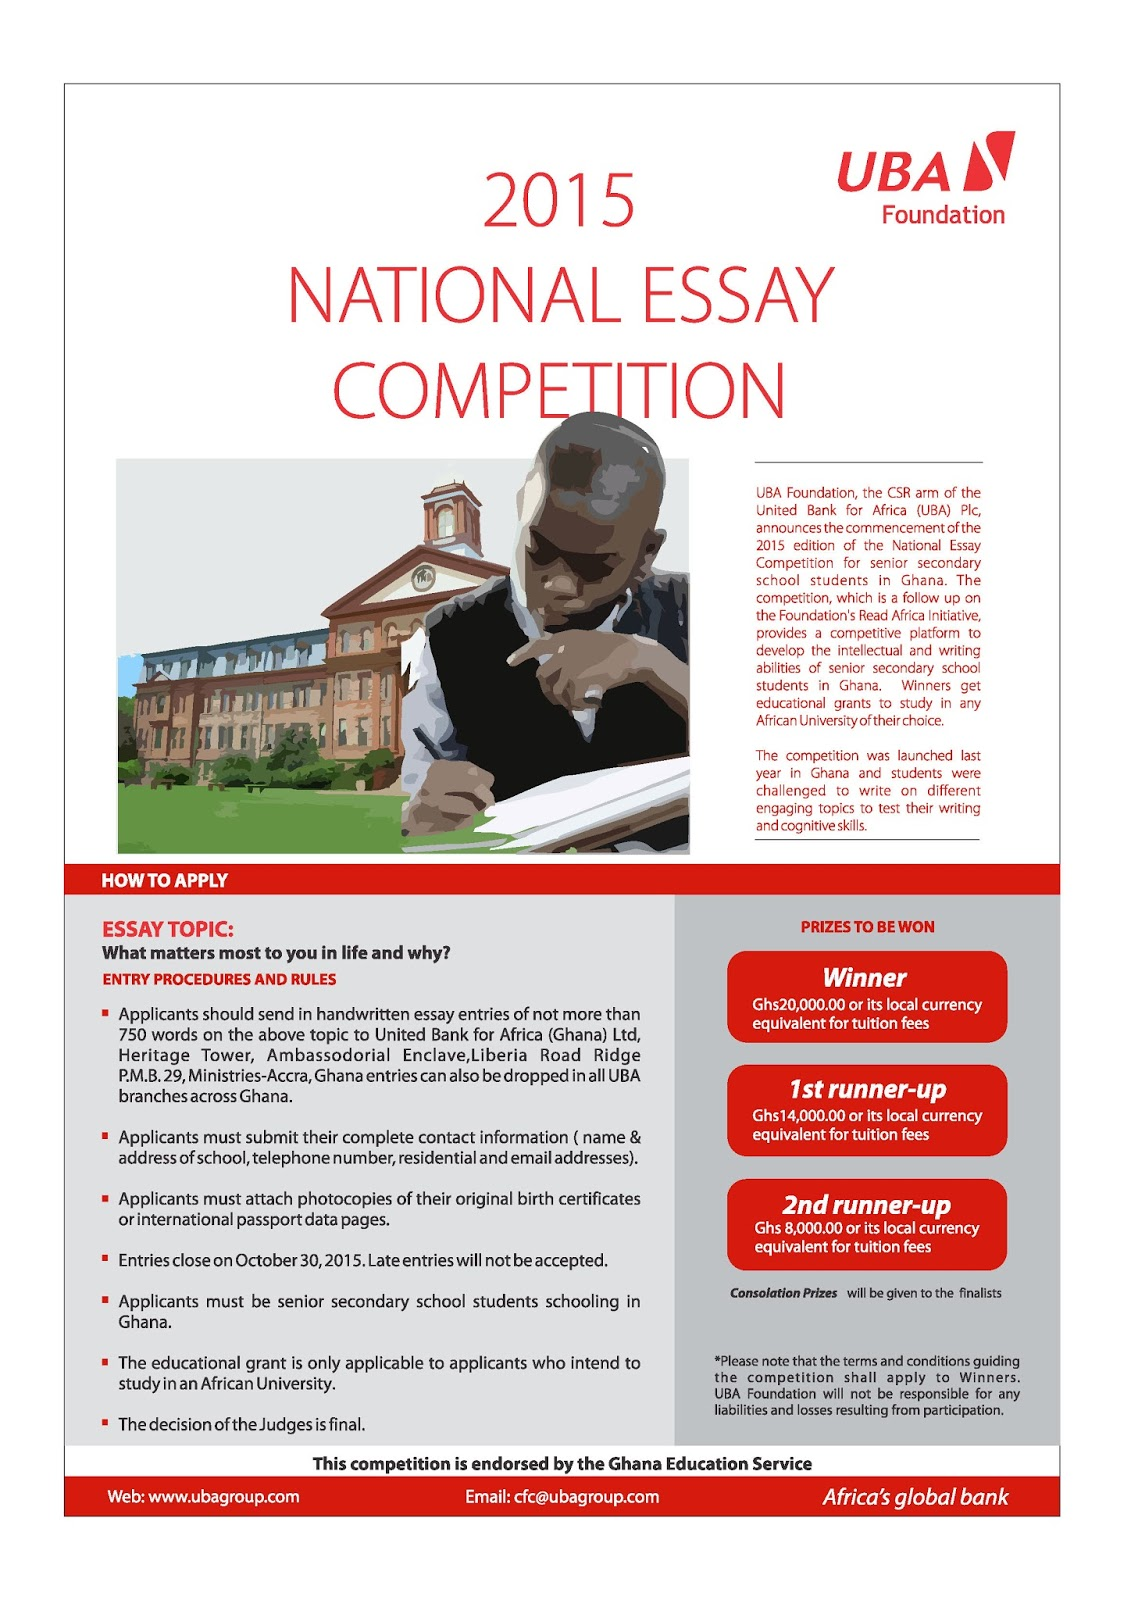 staton essay prize 2015